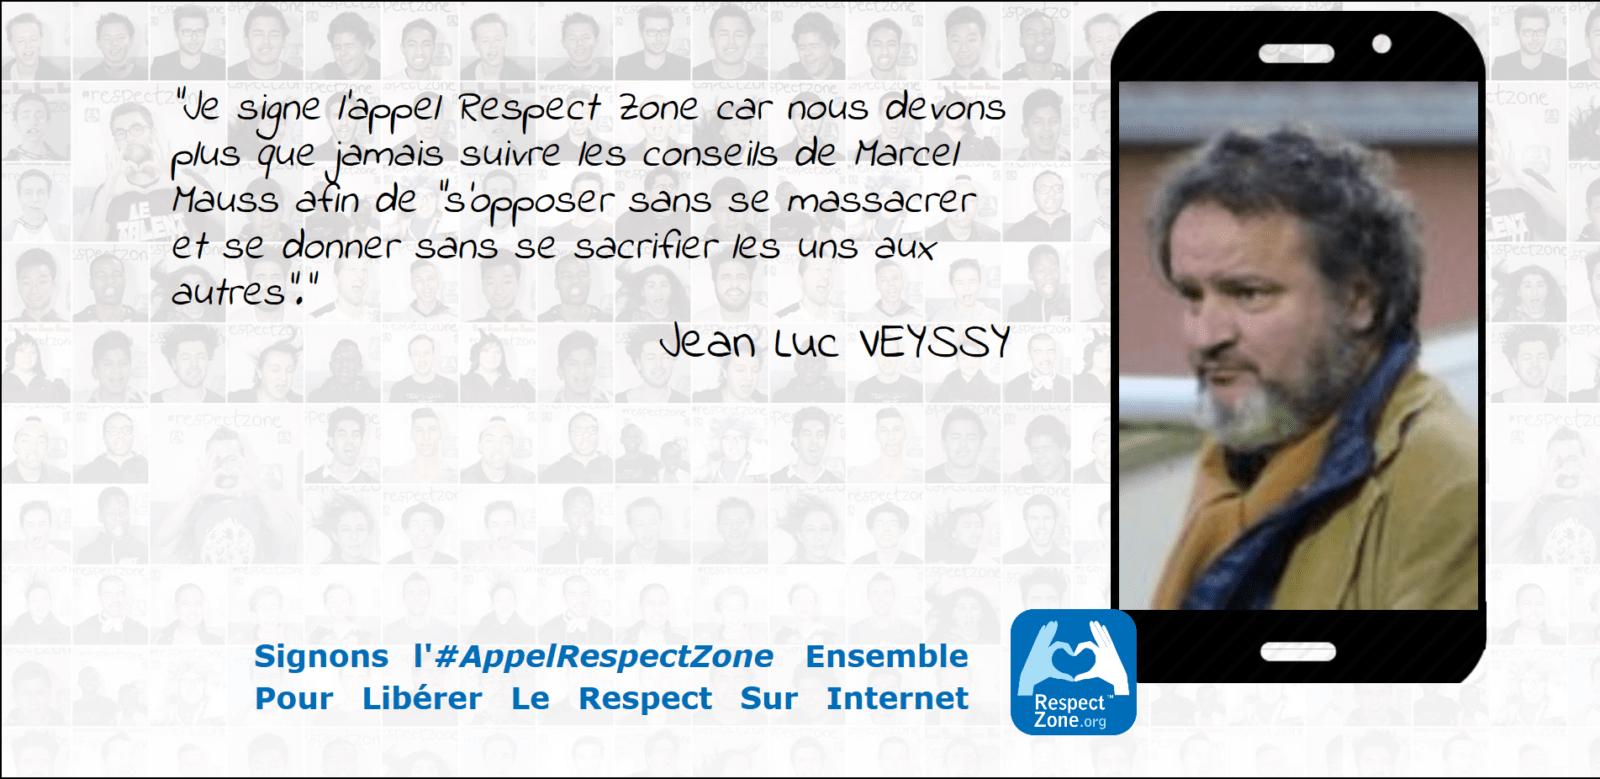 Jean Luc VEYSSY